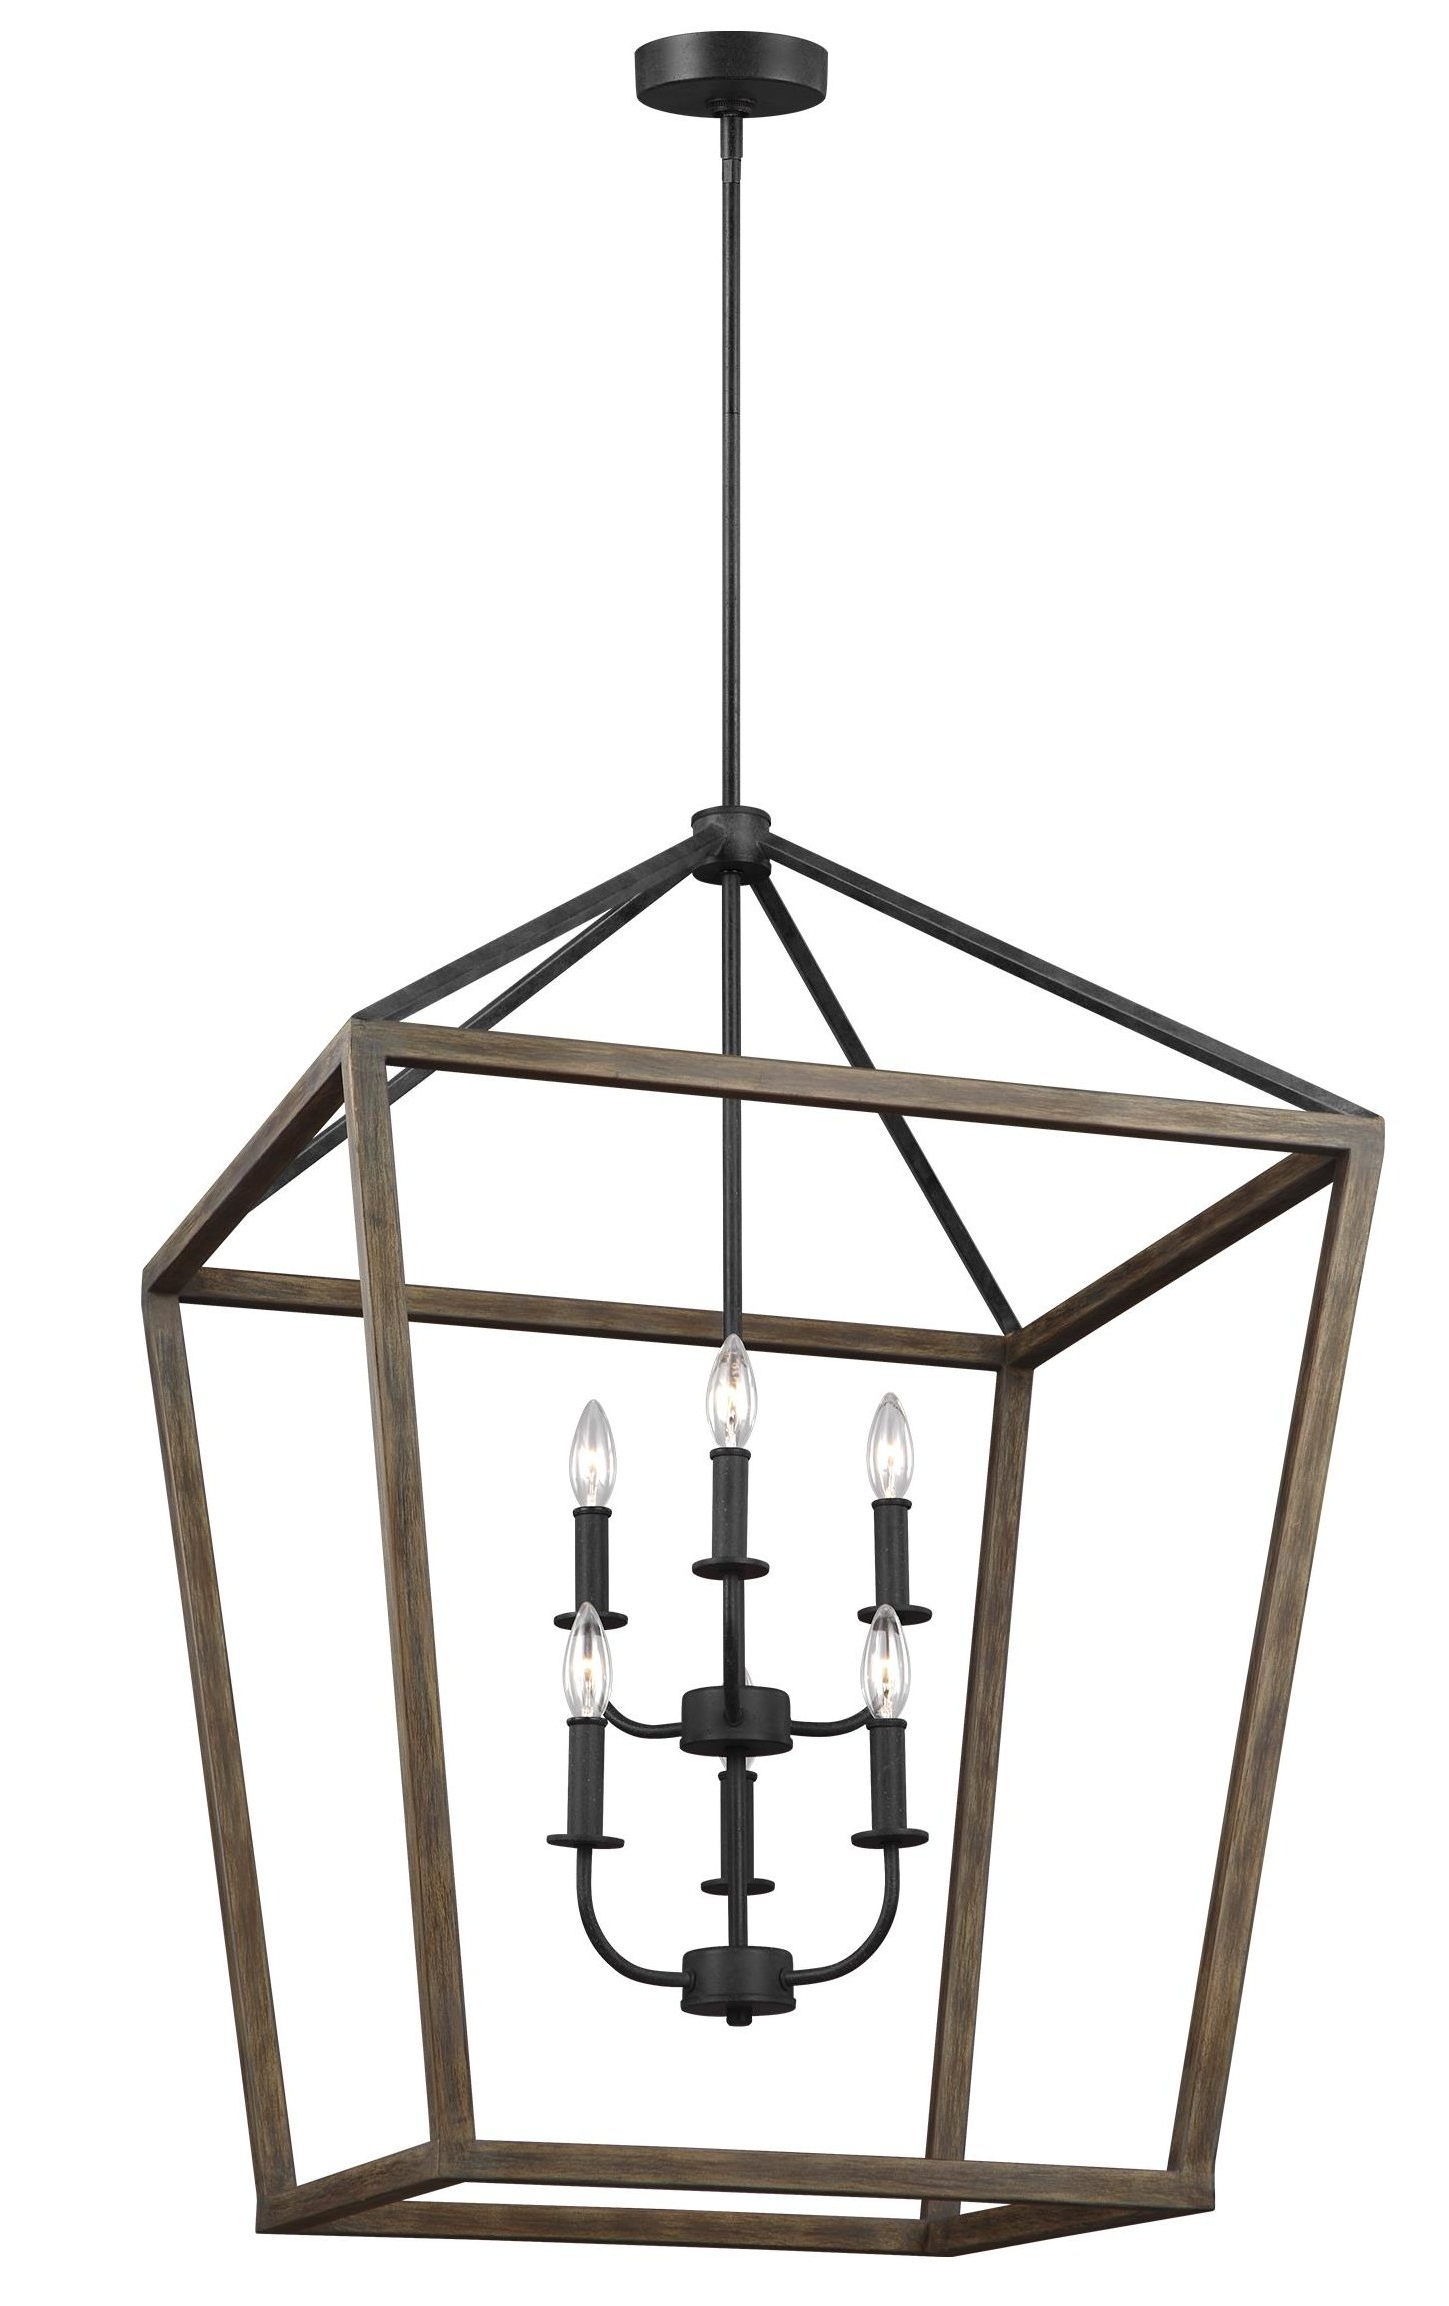 Newest Carmen 6 Light Lantern Geometric Pendants With Regard To Natarsha 6 Light Lantern Geometric Pendant (View 20 of 25)